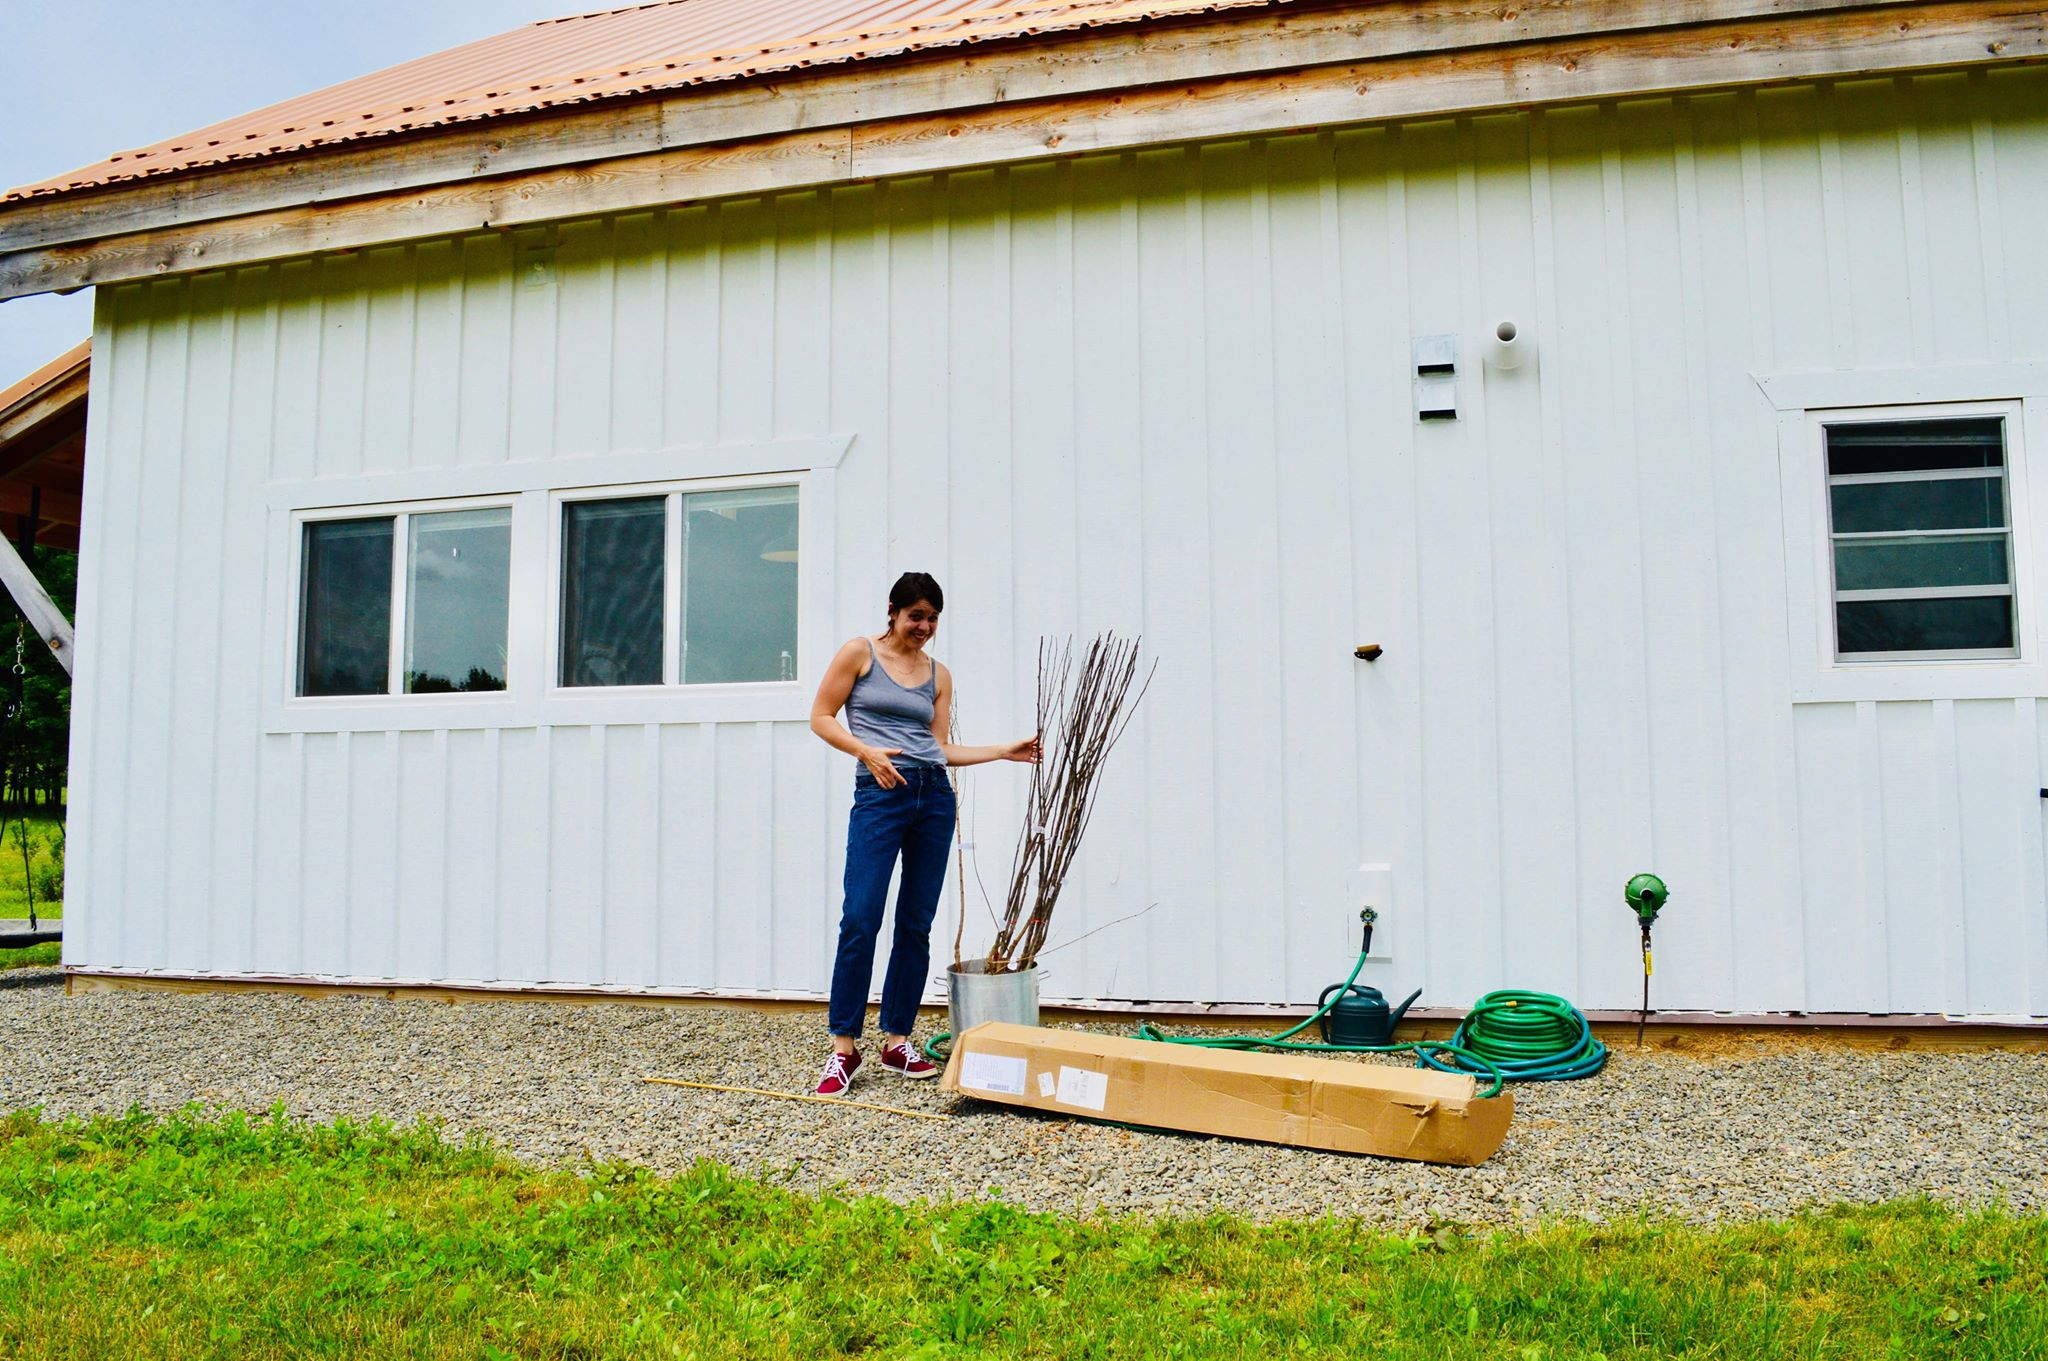 mini orchard, homesteading, farmette, microfarm, women who farm, fruit trees, organic homestead, permaculture, bioswales